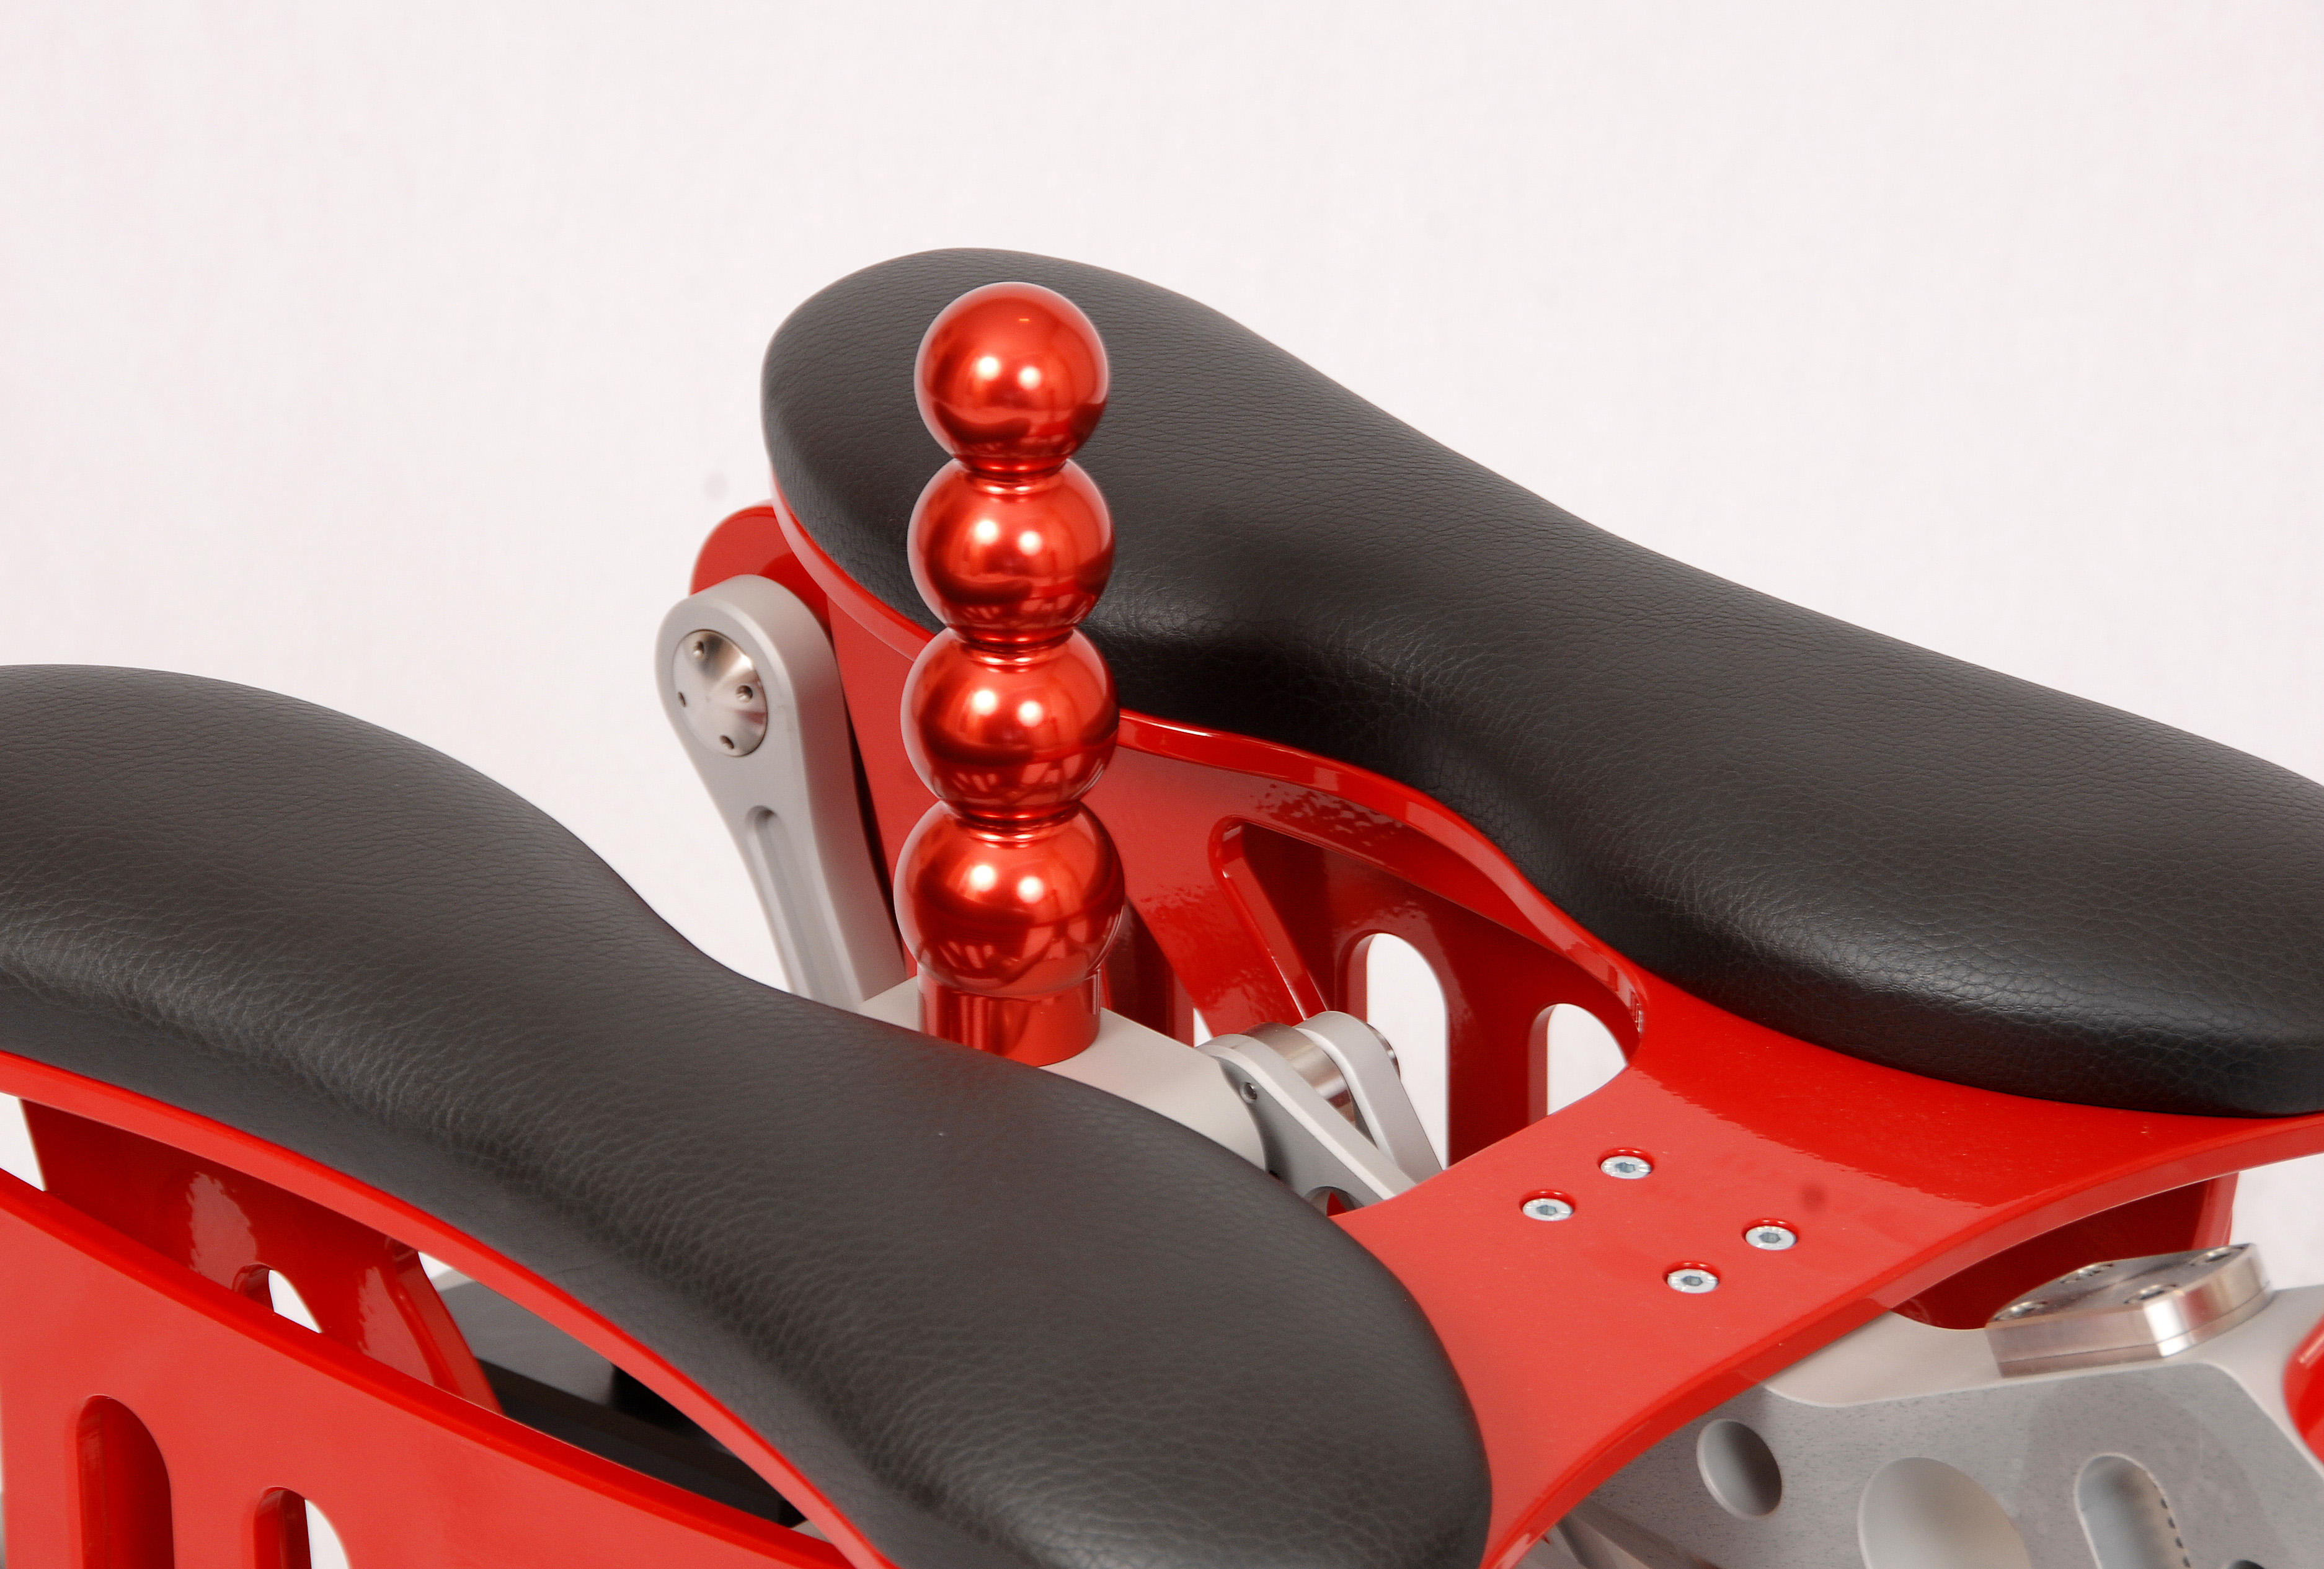 Fahrradsattel mit dildo